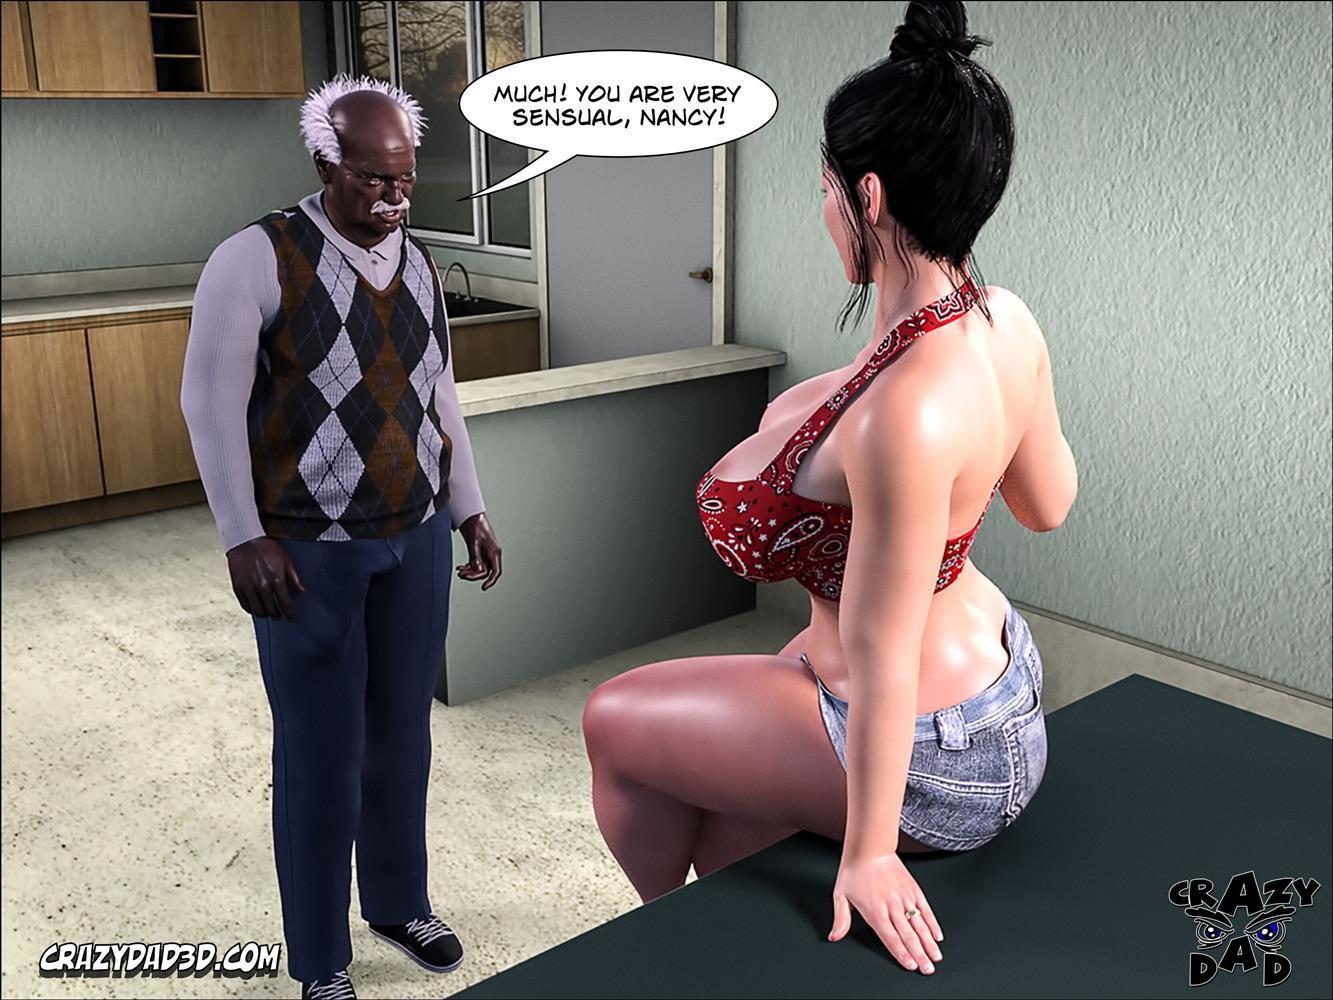 Mom's Help 16 [Crazy Dad 3D] - Foto 62